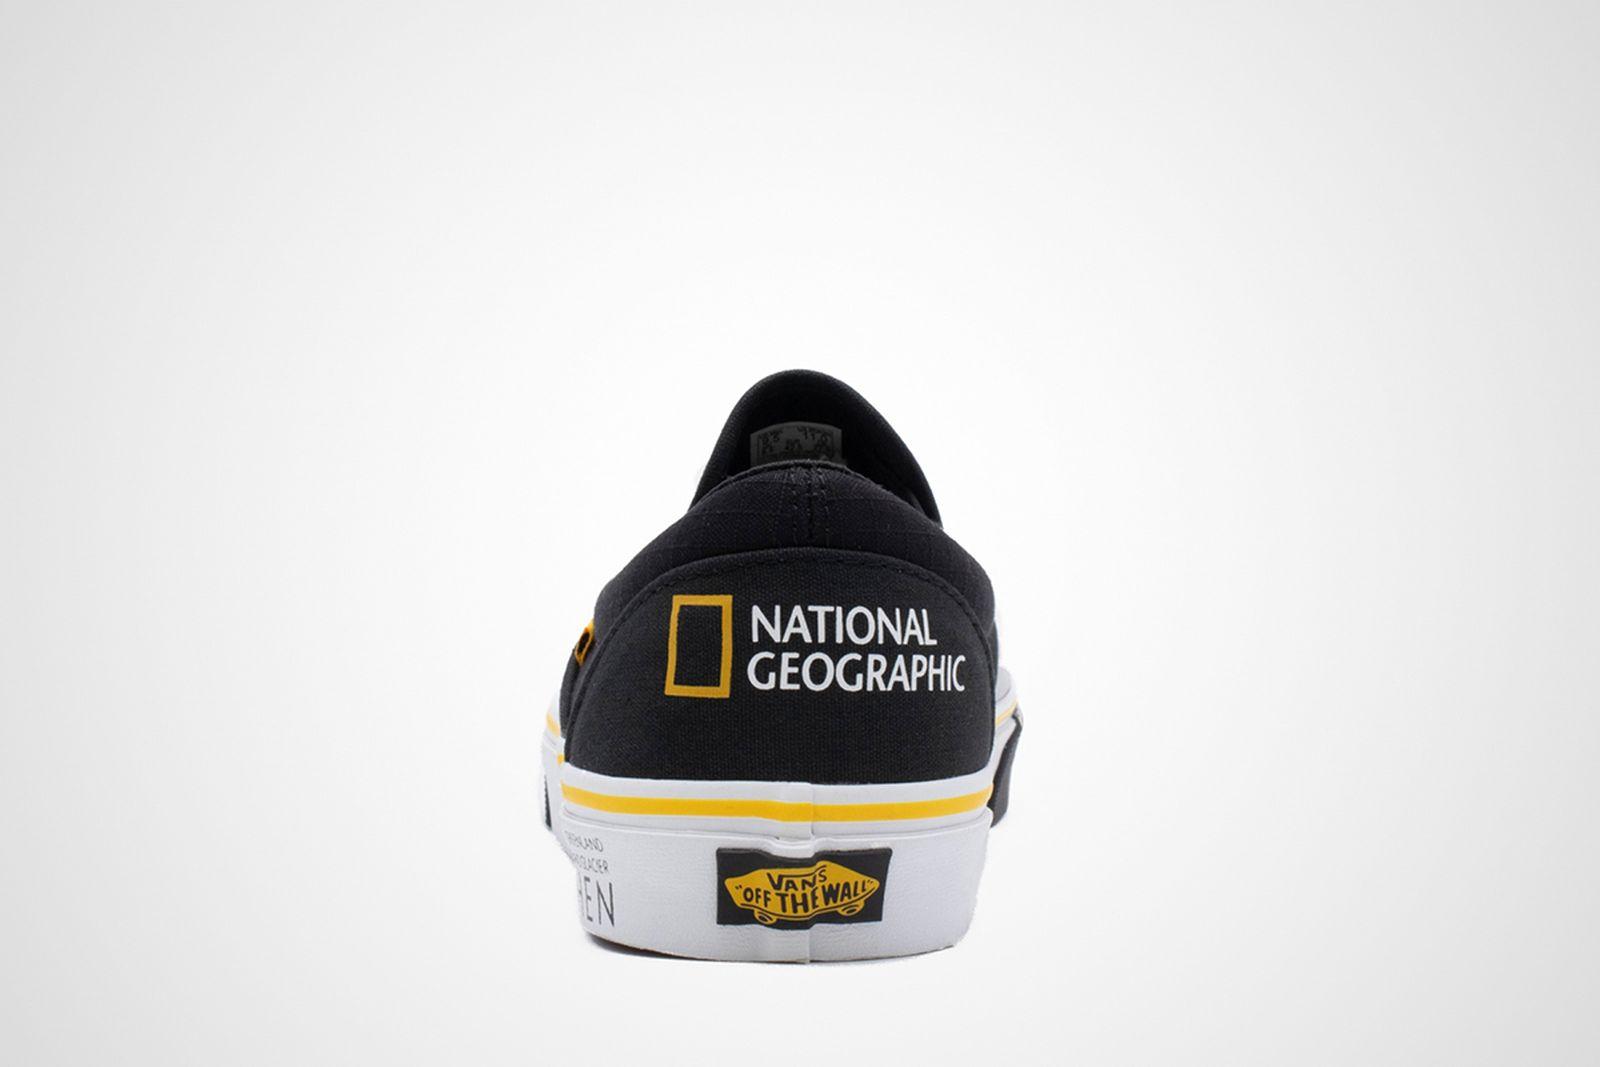 National Geographic Vans Slip-On